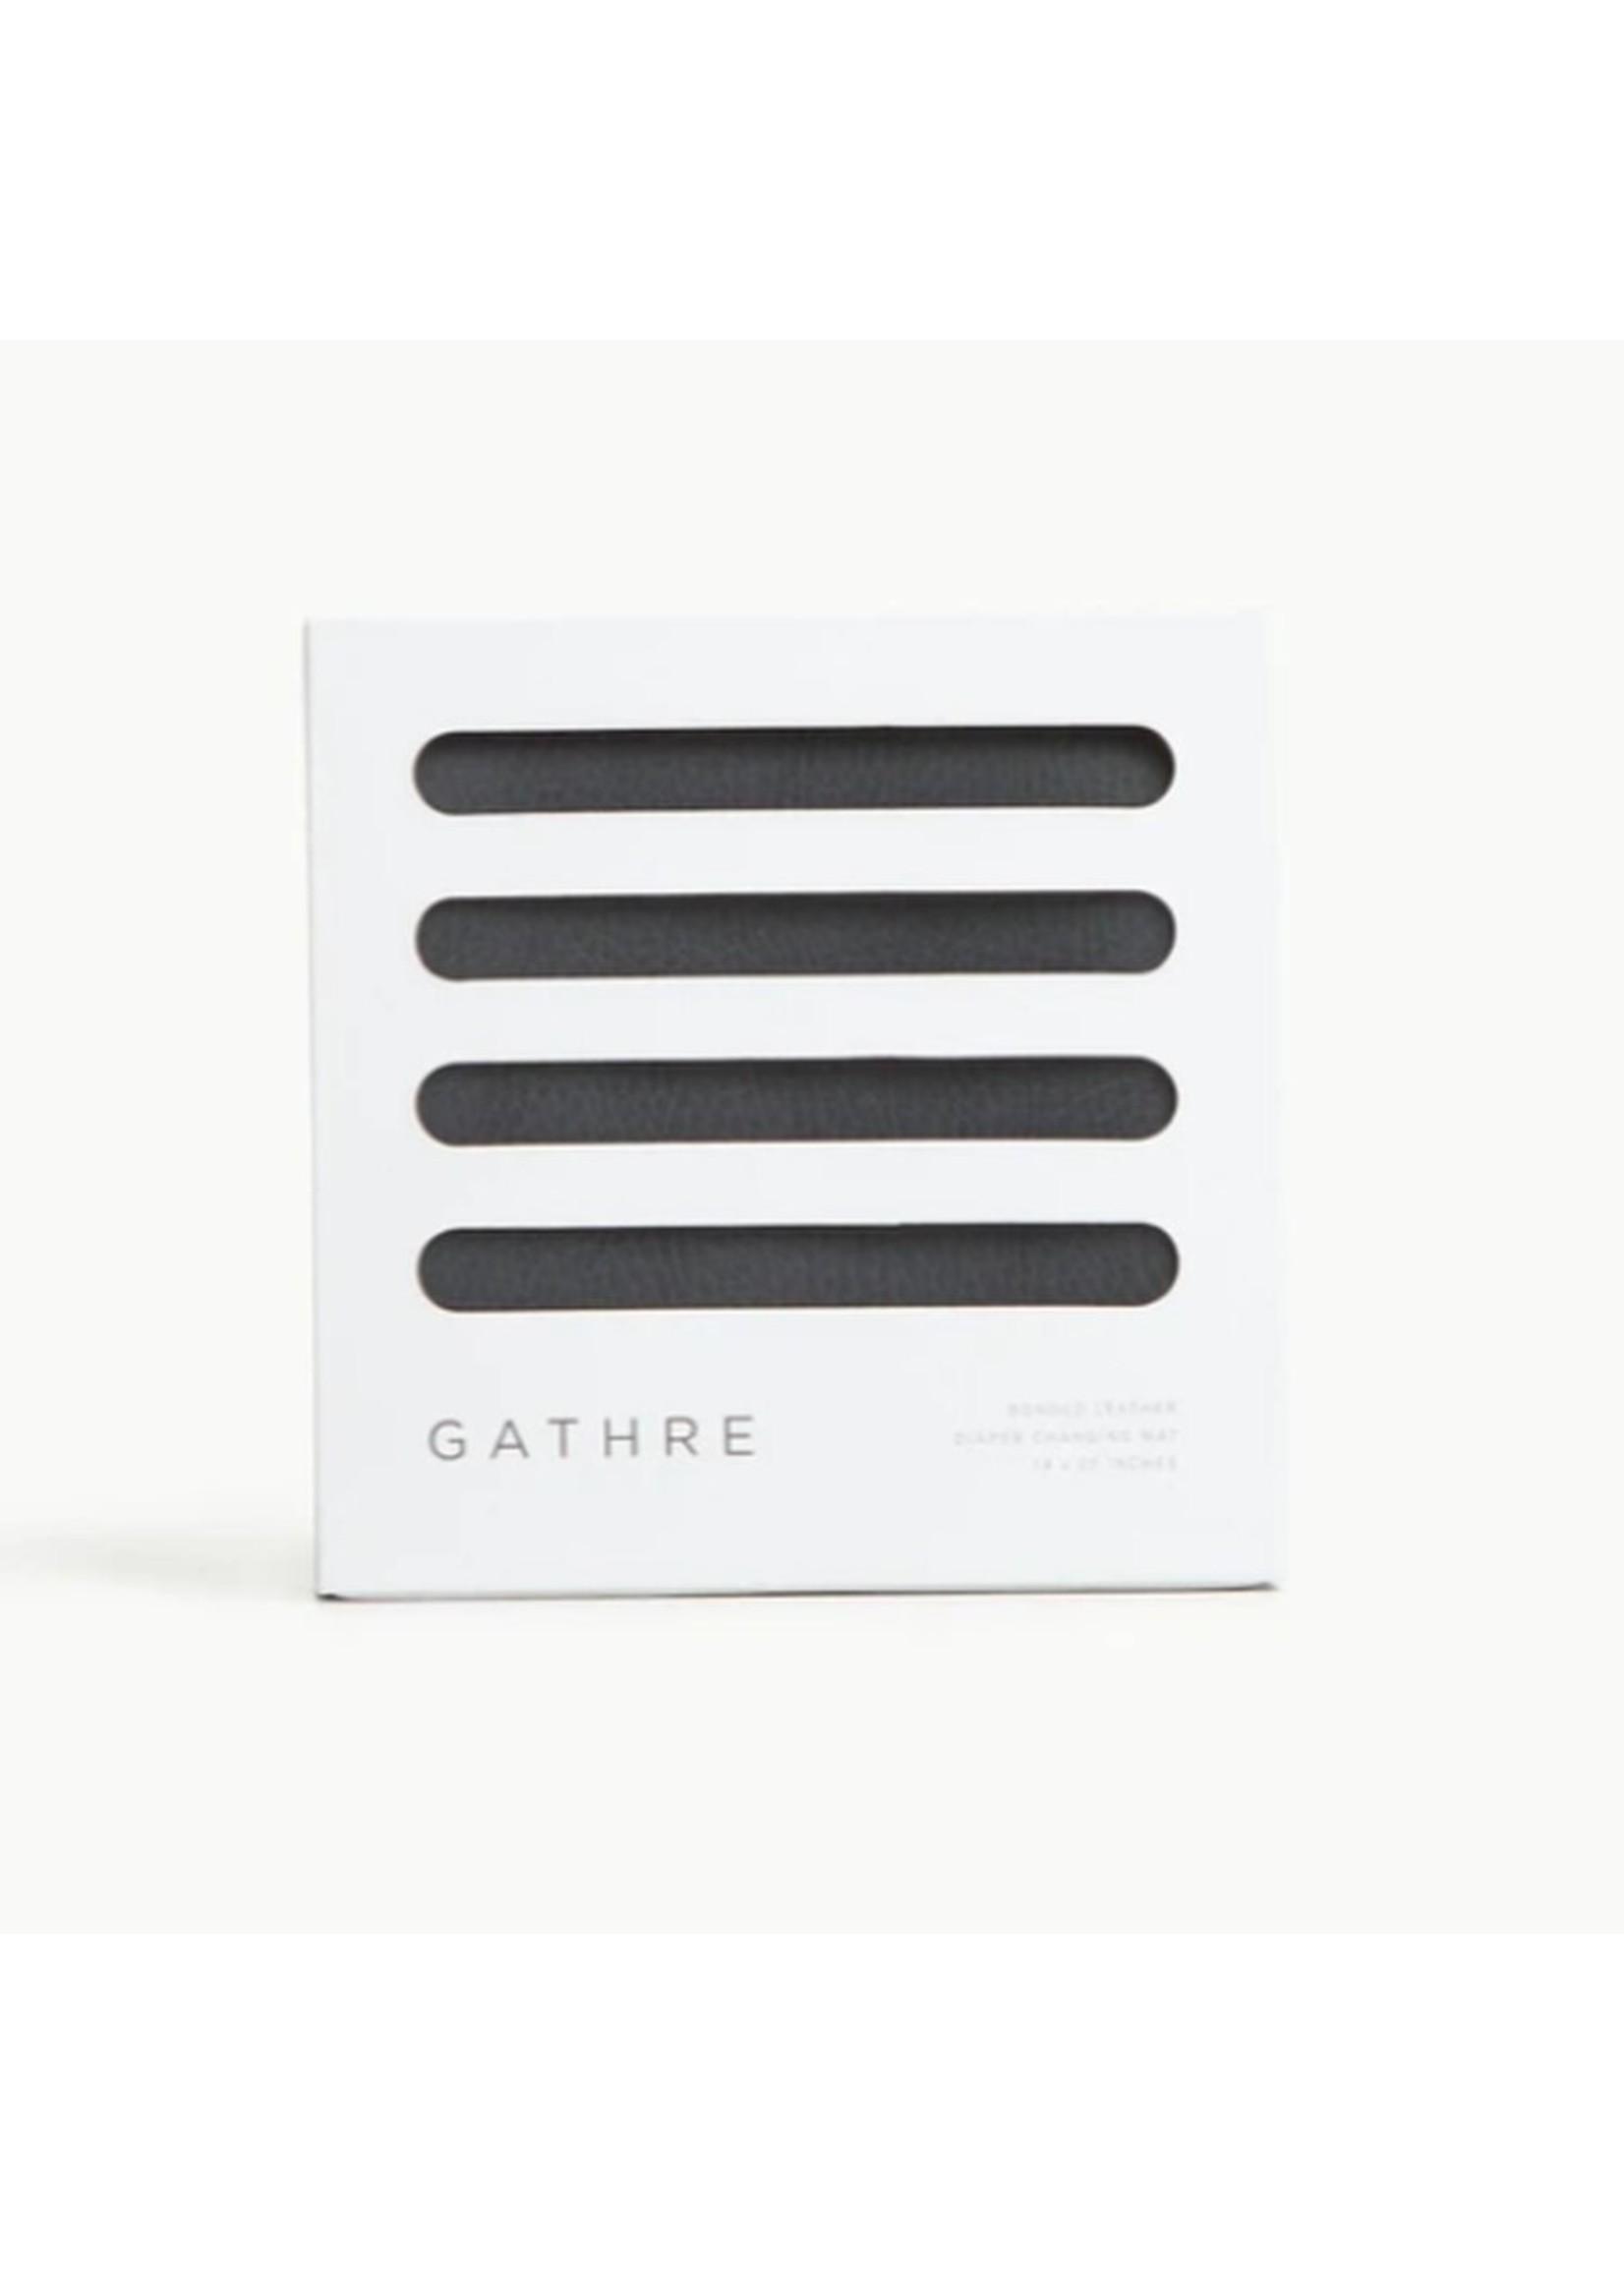 Gathre Micro Mat Raven